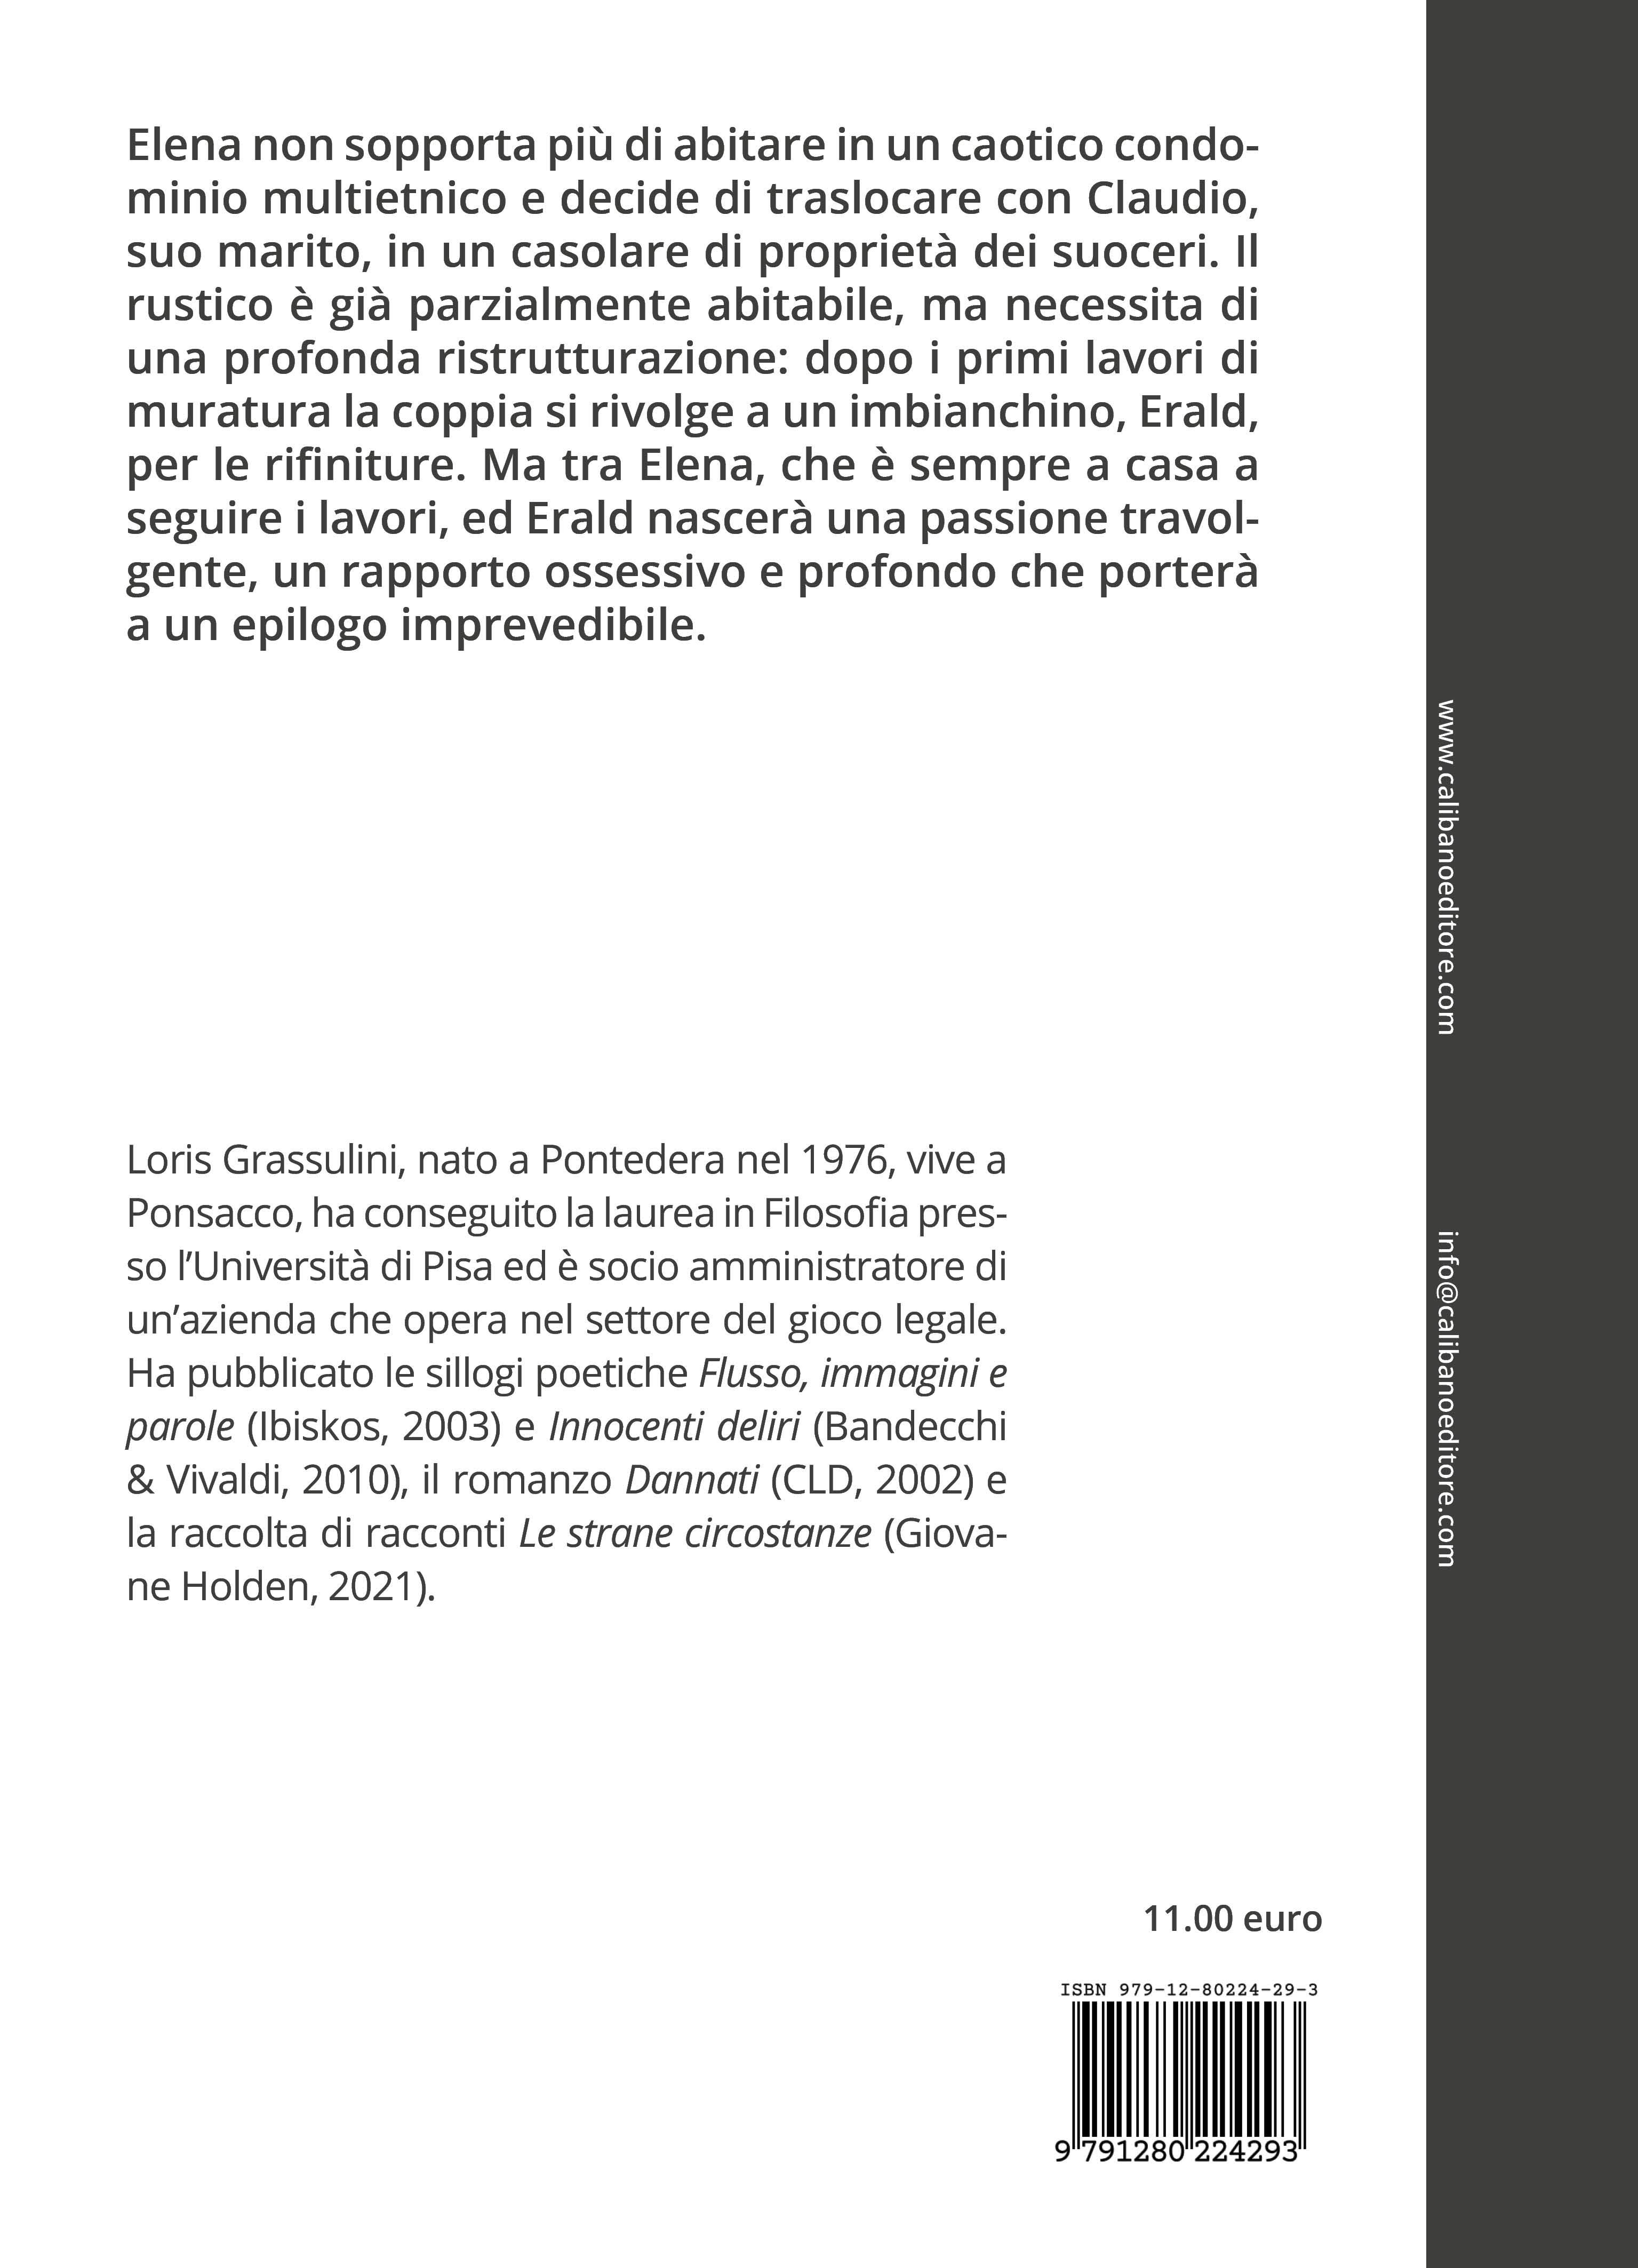 Virtuosismi da imbianchino-image-2%>